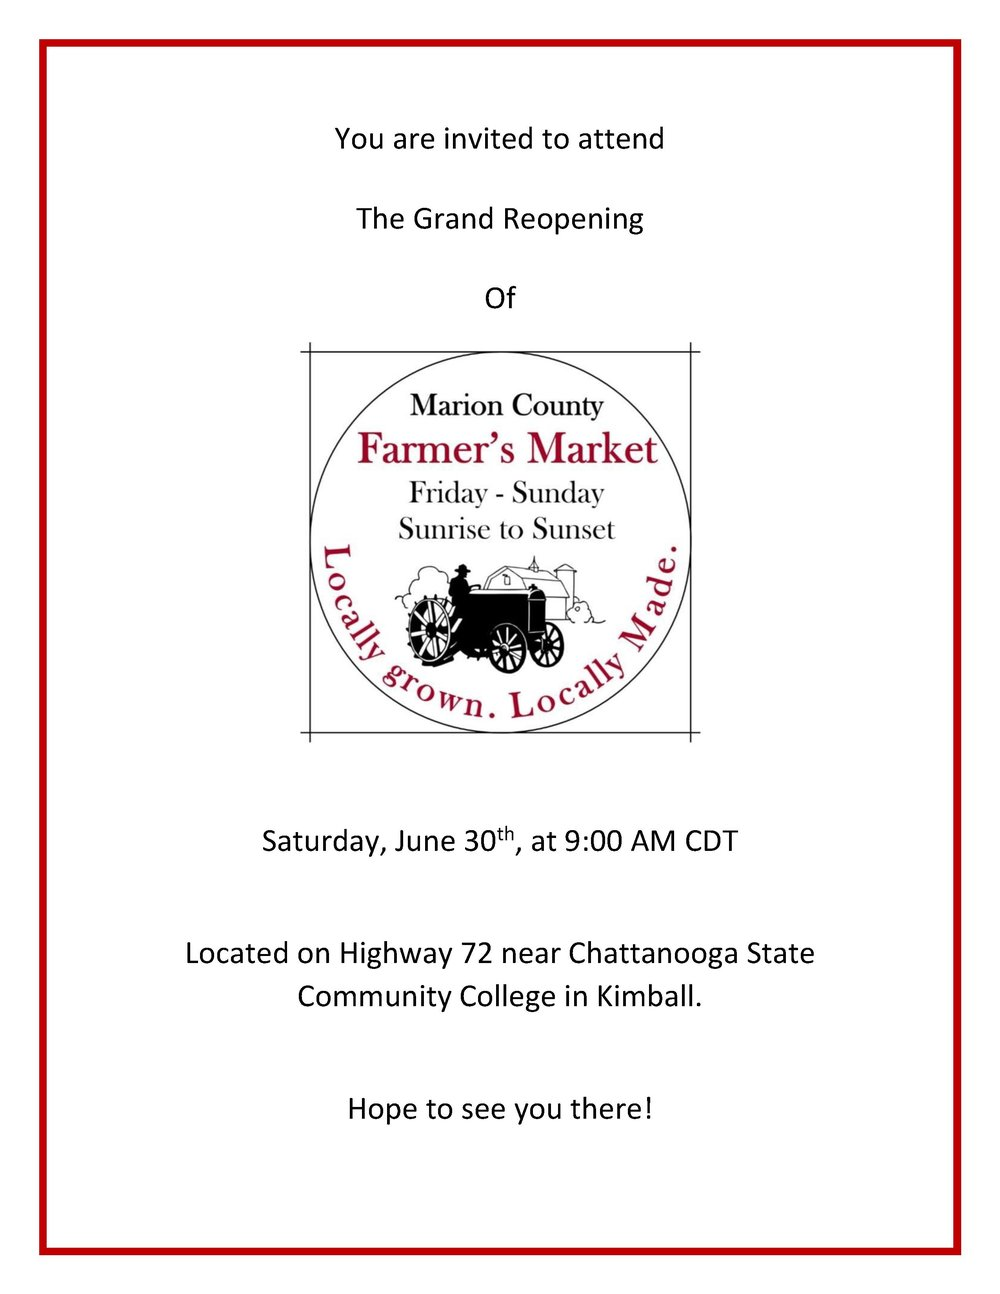 Farmers Market Reopening.jpg